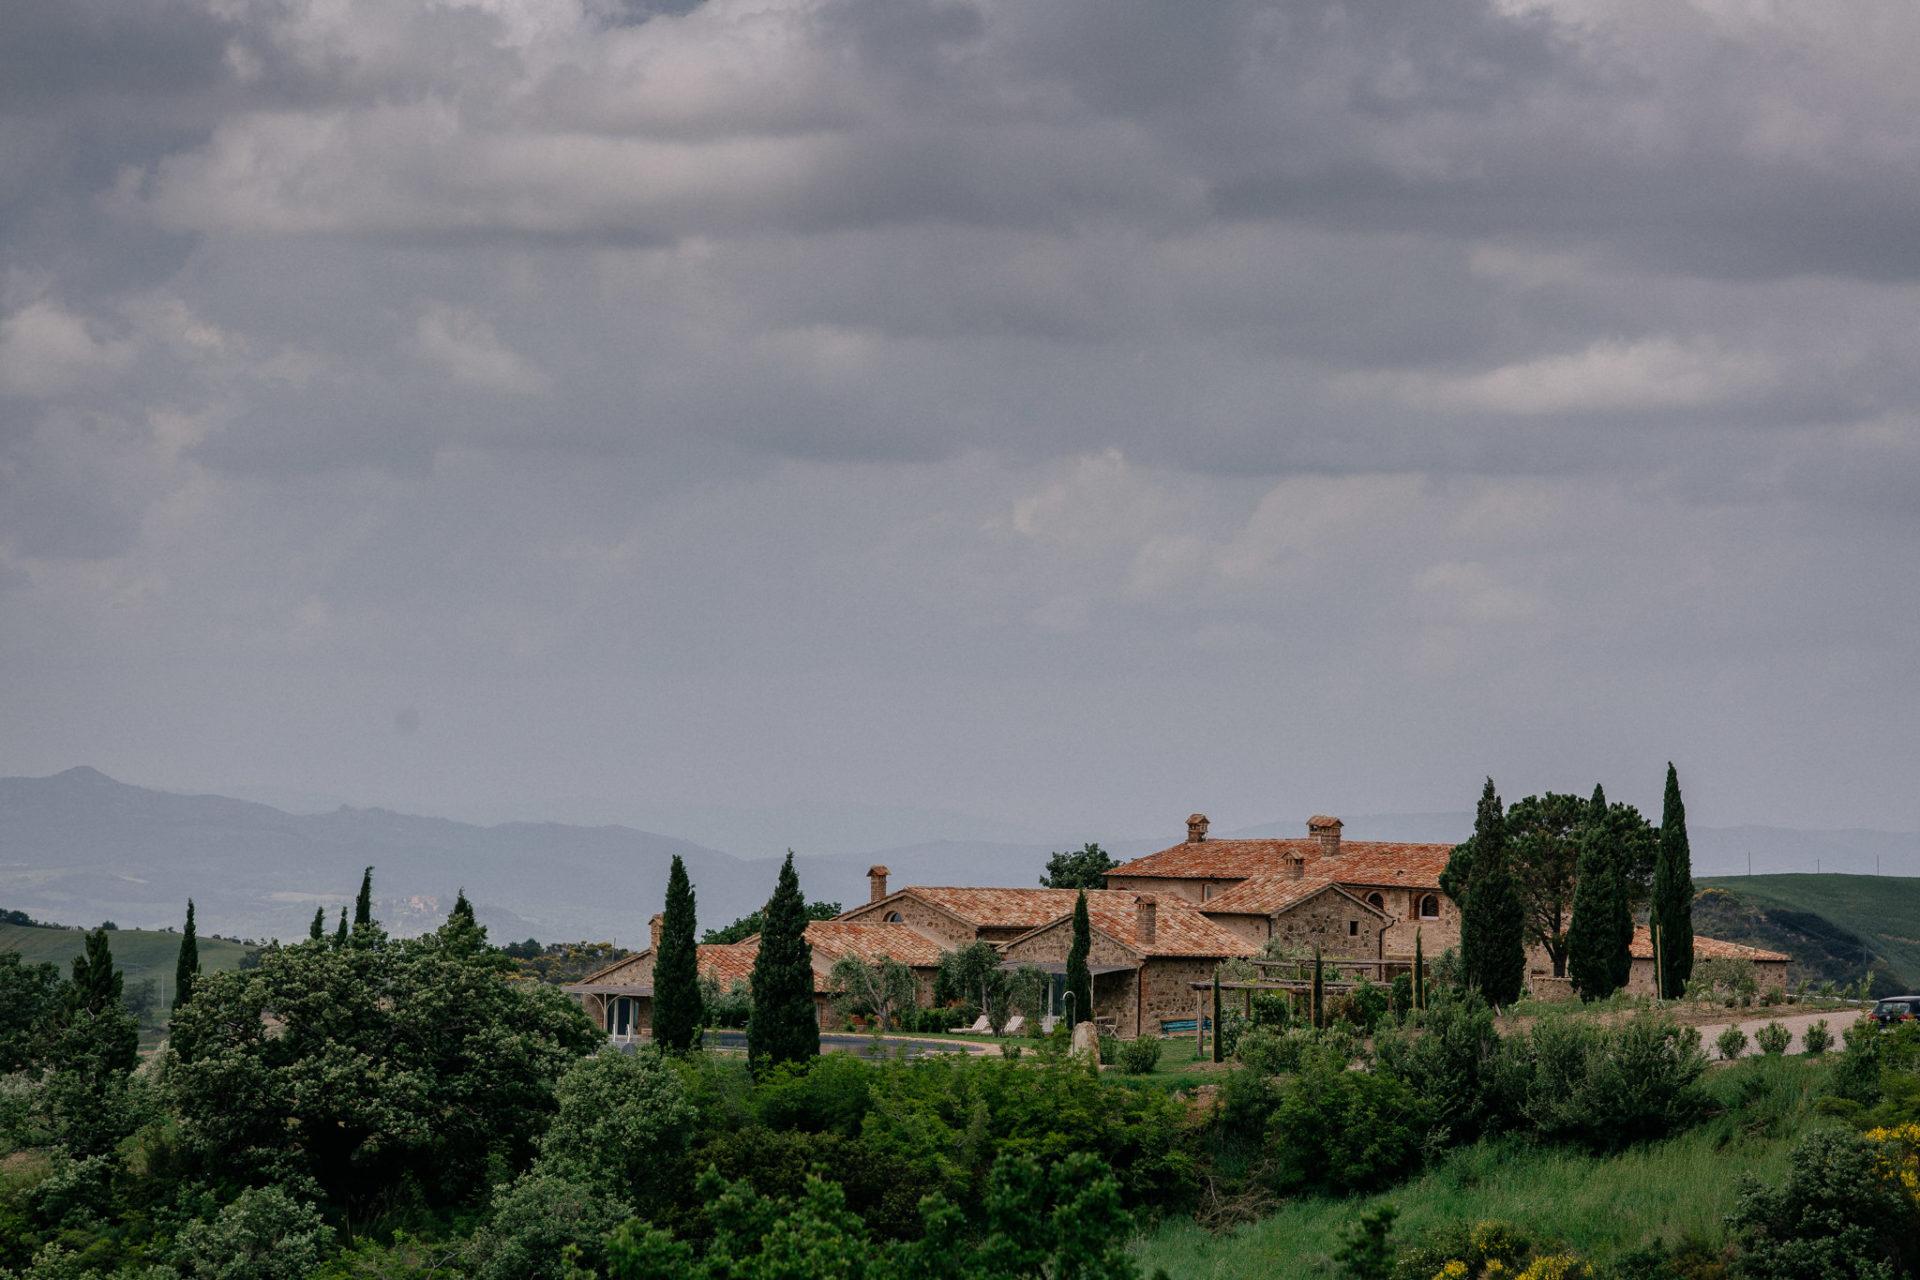 wedding photographer tuscany-italy road trip with dog-boutique hotel-exclusive romantic gateway-grosseto region-dimora santa margherita